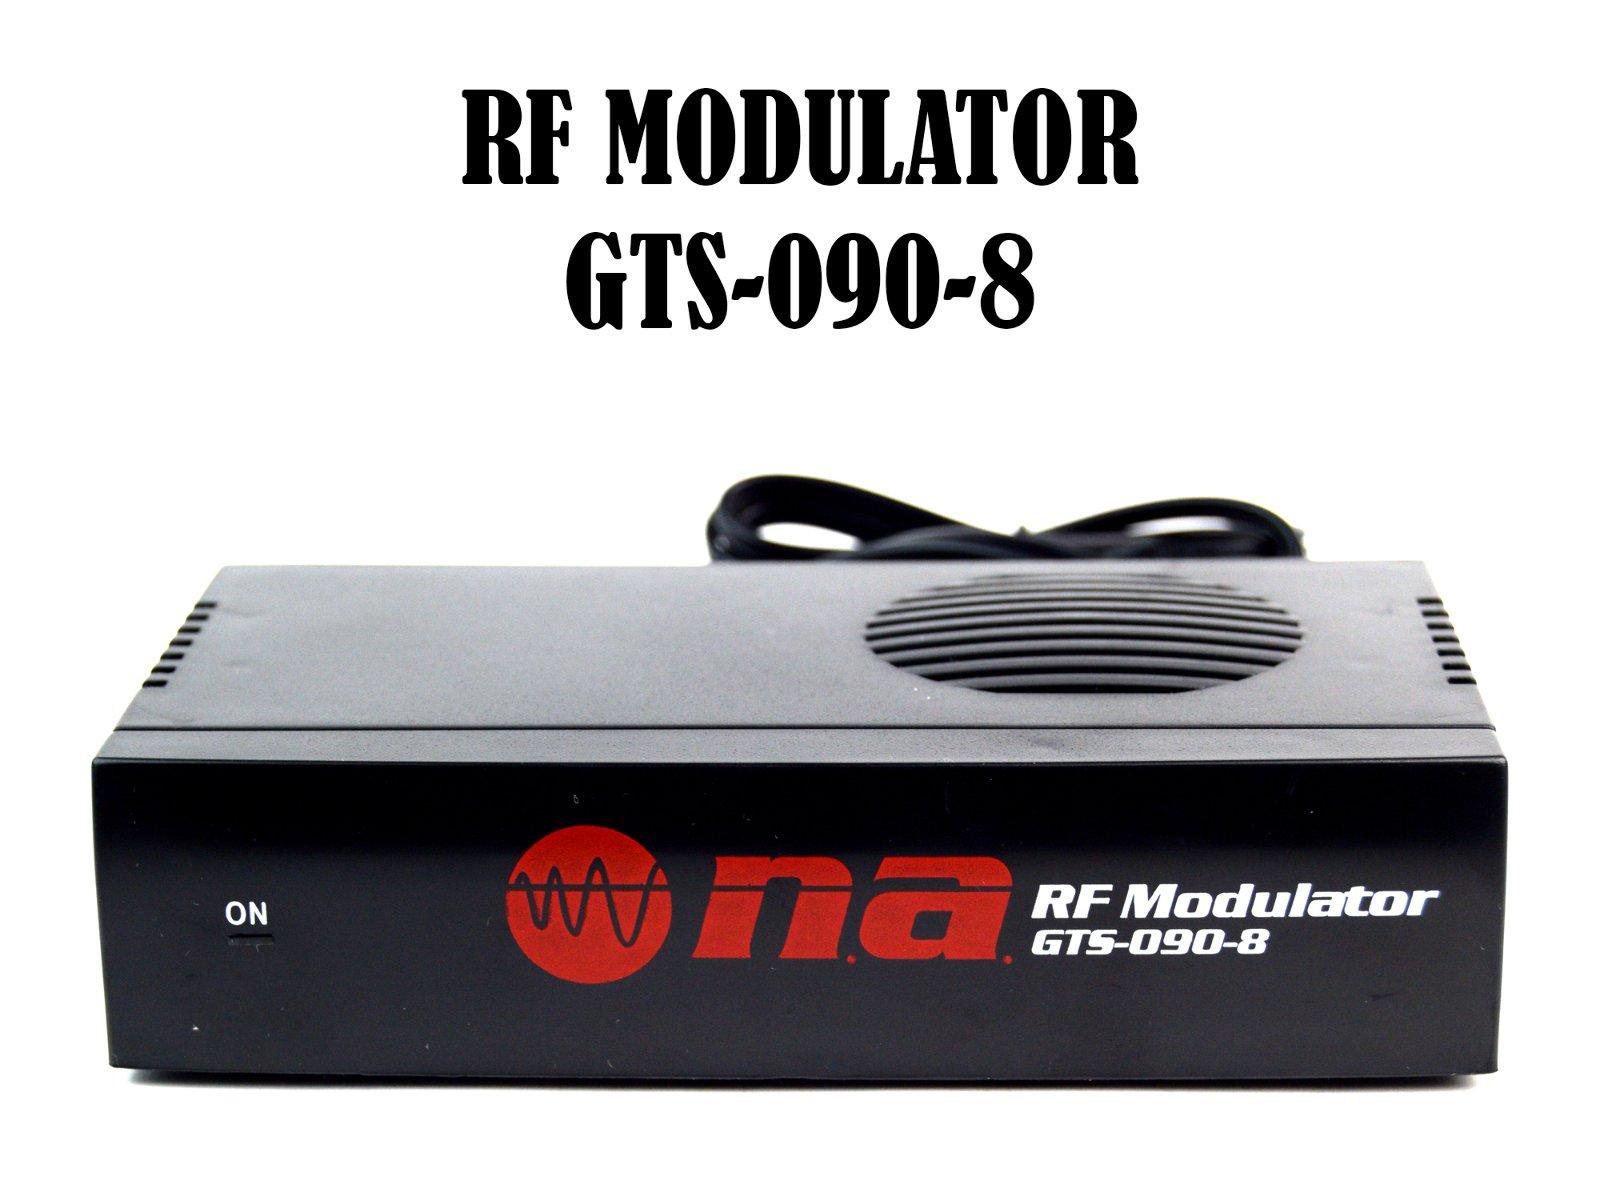 Universal RF Modulator RCA Audio Video to Coaxial Coax F-Type With S Video GTS-090-8